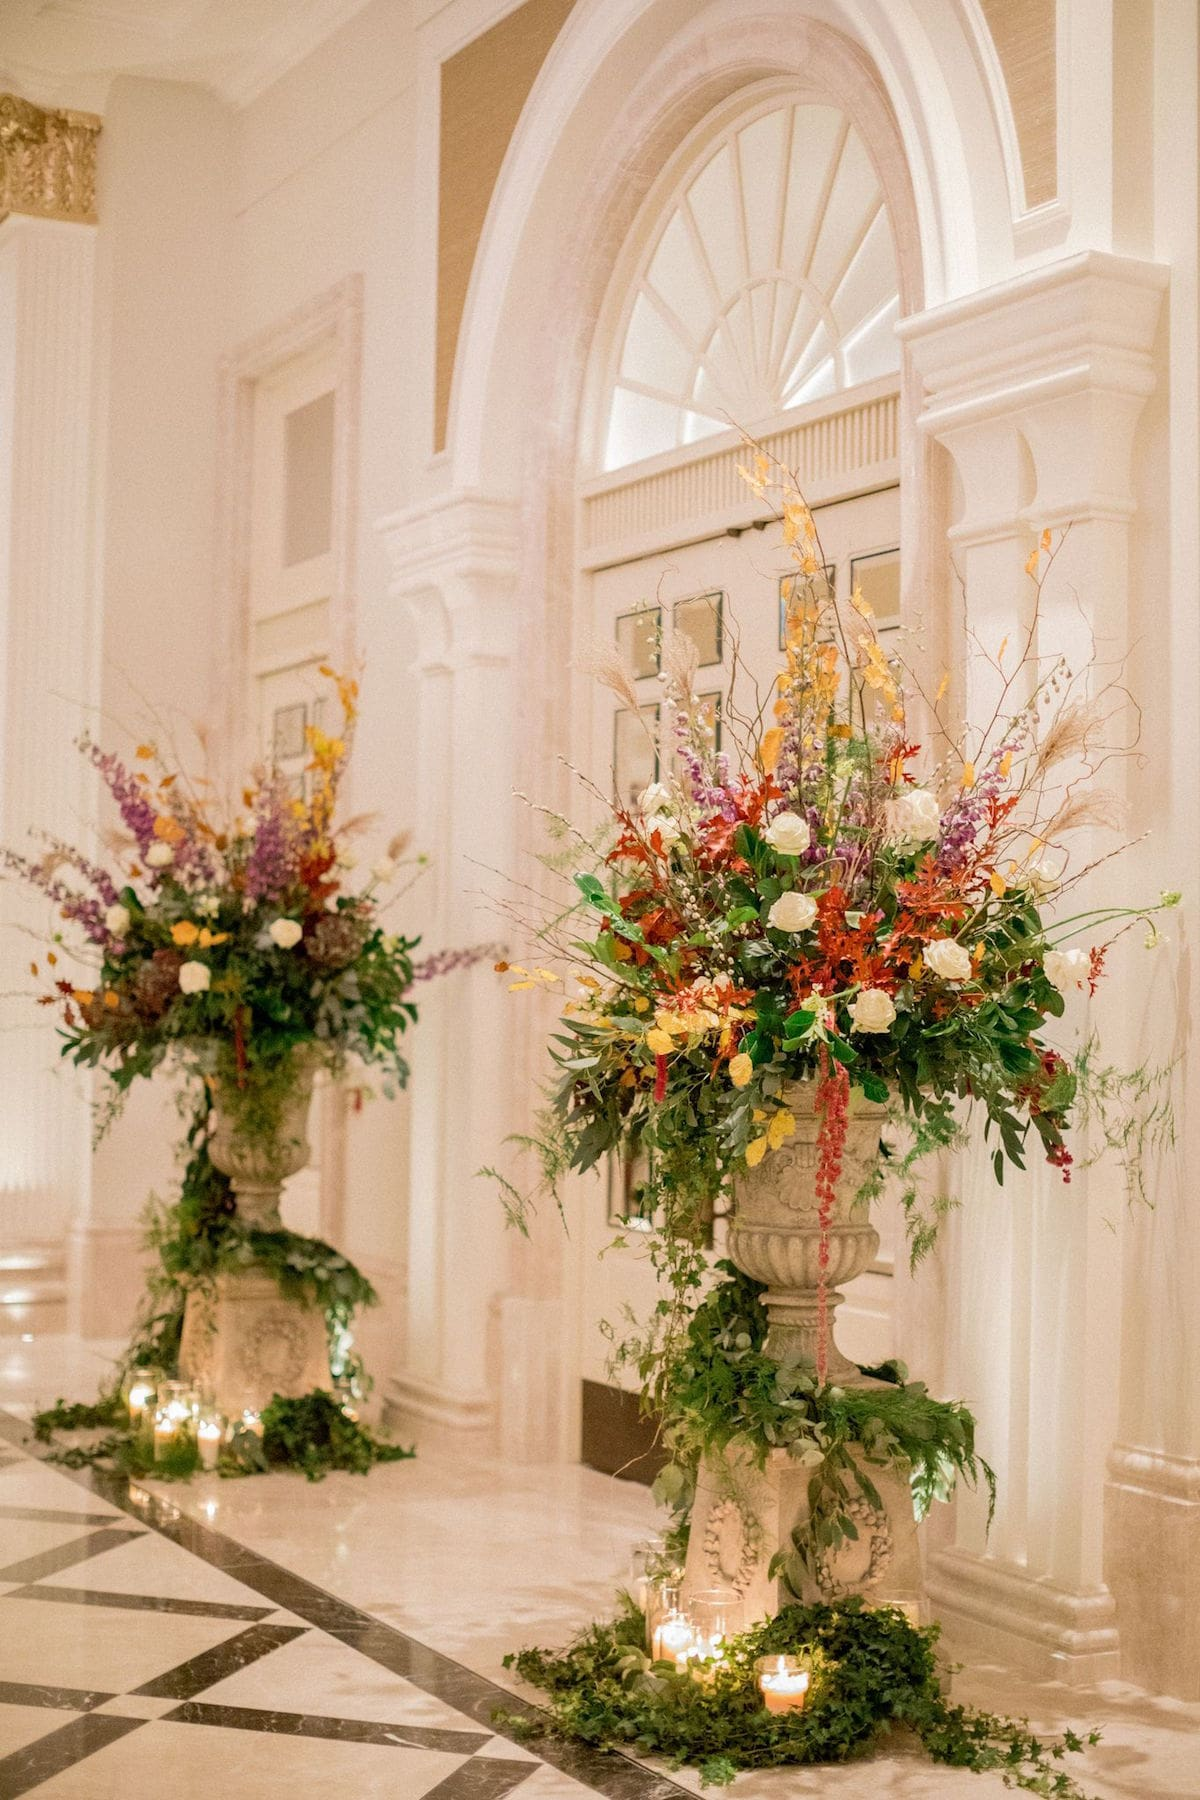 Adare Manor Grand Ballroom entrance with floral arrangements